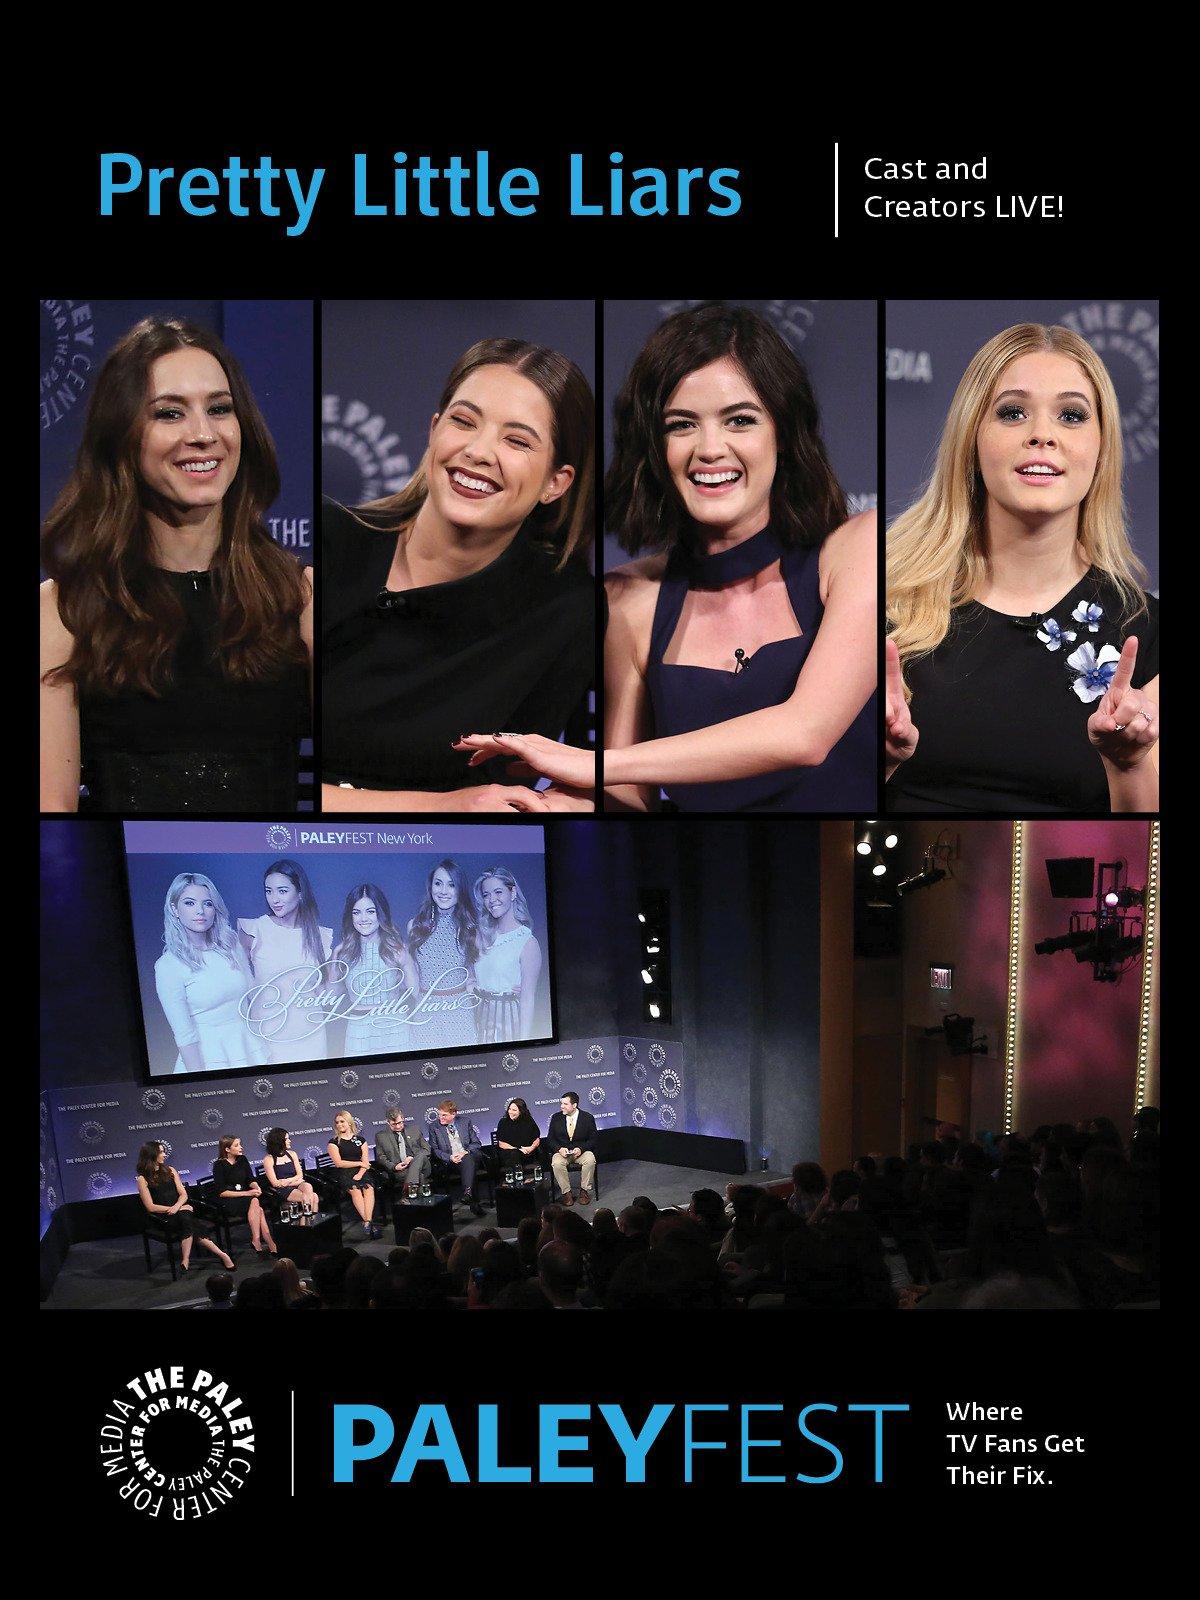 Pretty Little Liars: Cast and Creators PaleyFest